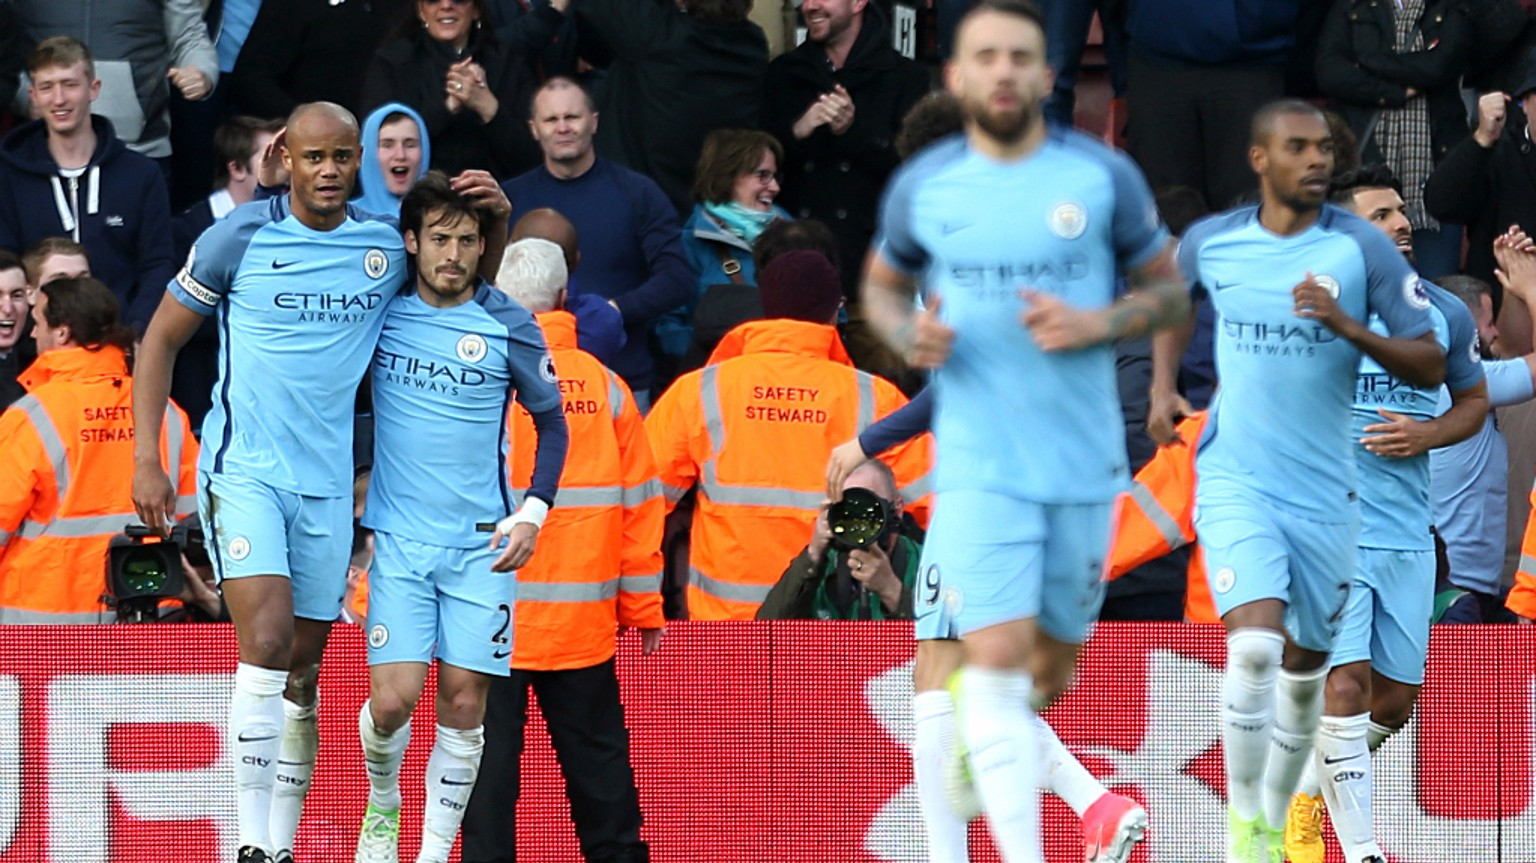 DELIGHT: Silva congratulates the City captain after breaking the deadlock with a fine header.